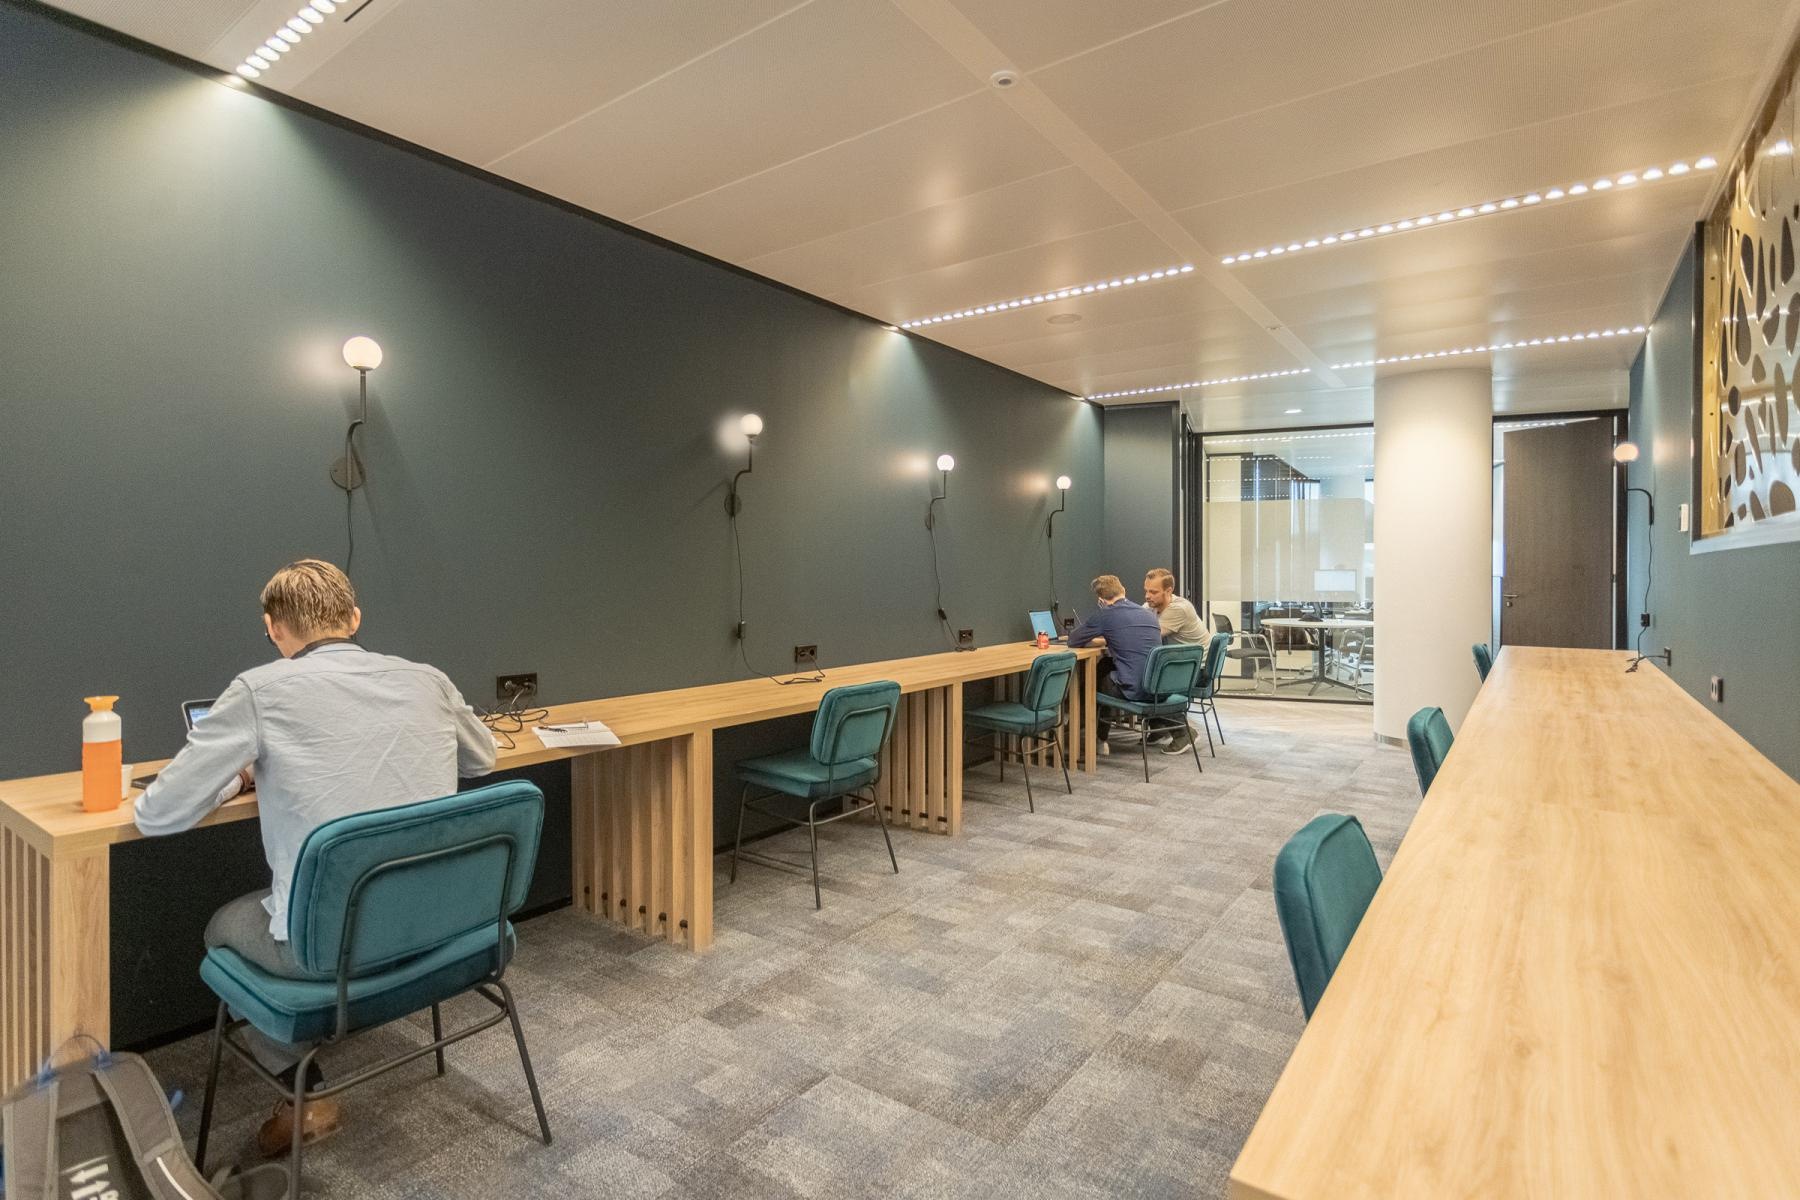 Rent office space Stadsplateau 7, Utrecht (17)